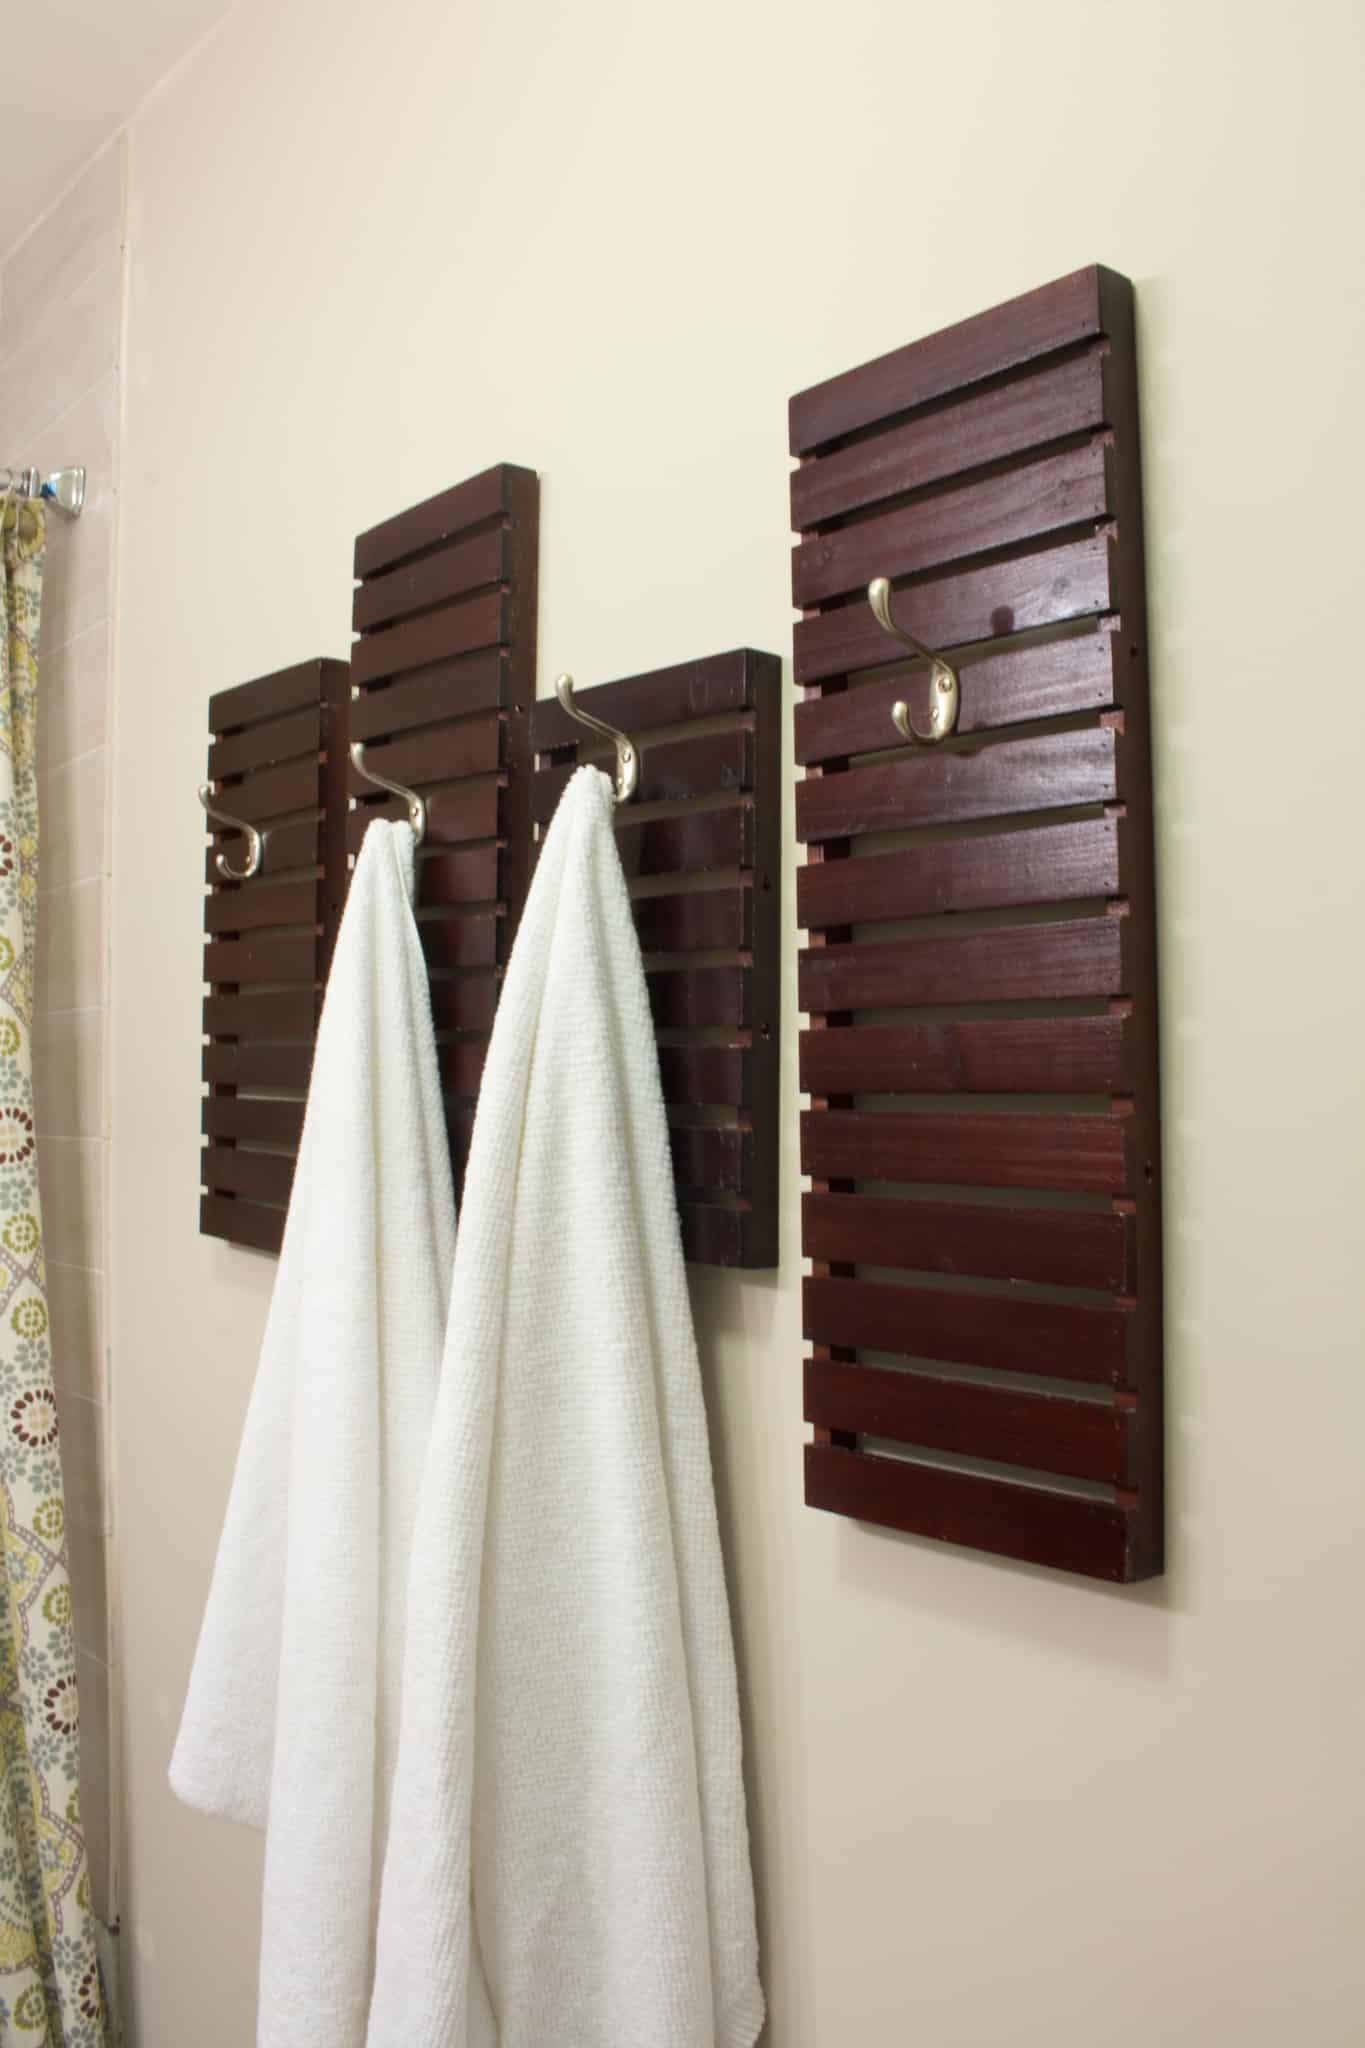 DIY Towel Rack Made From Shelves